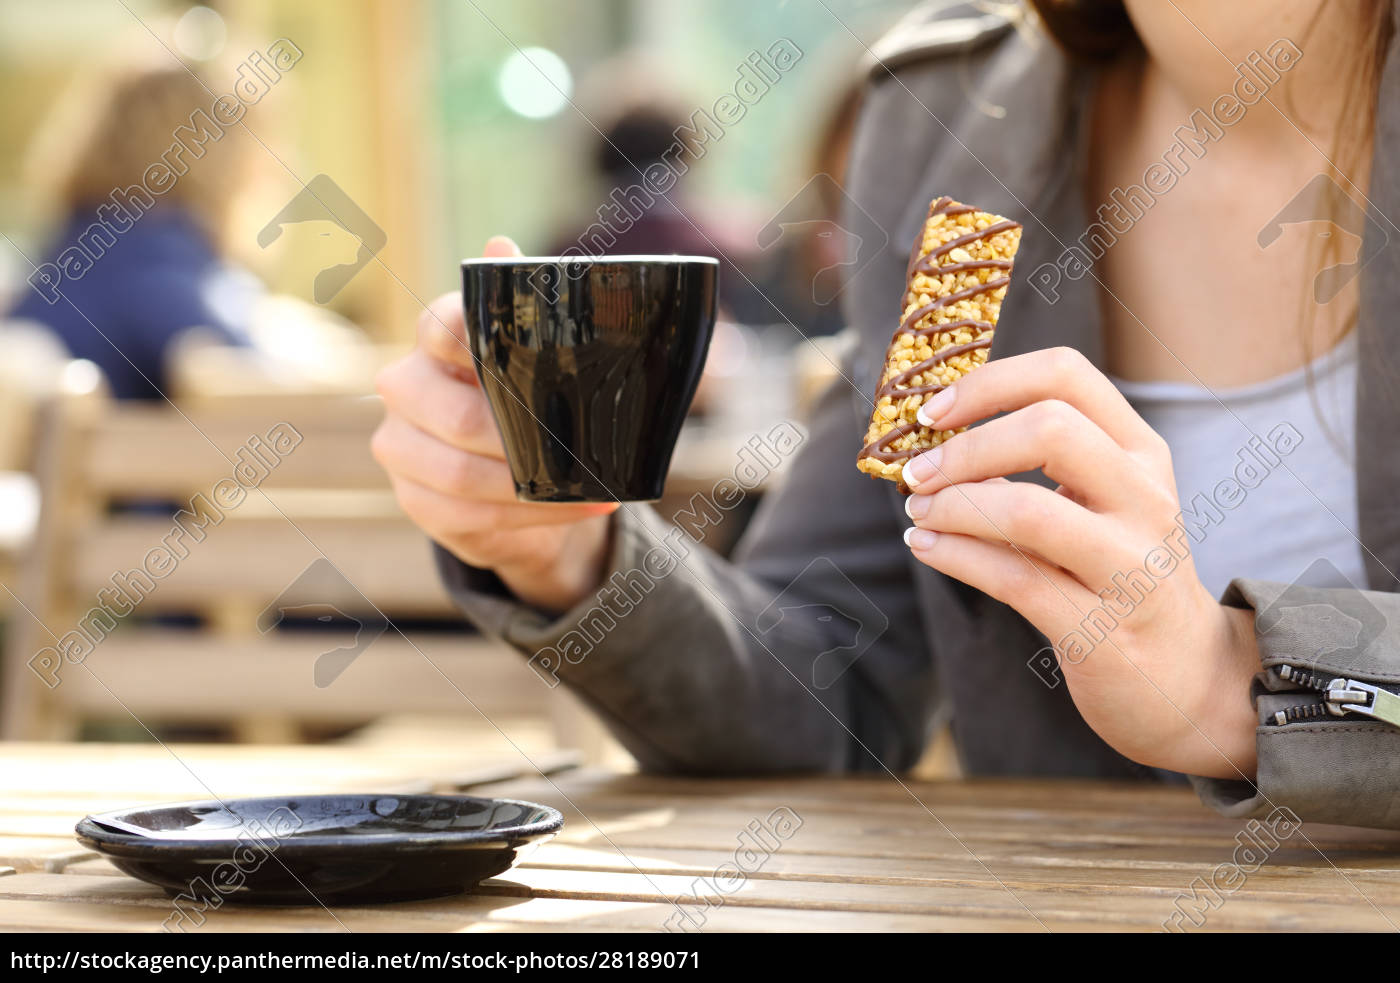 frau, hält, eine, snackbar, und, kaffeetasse - 28189071